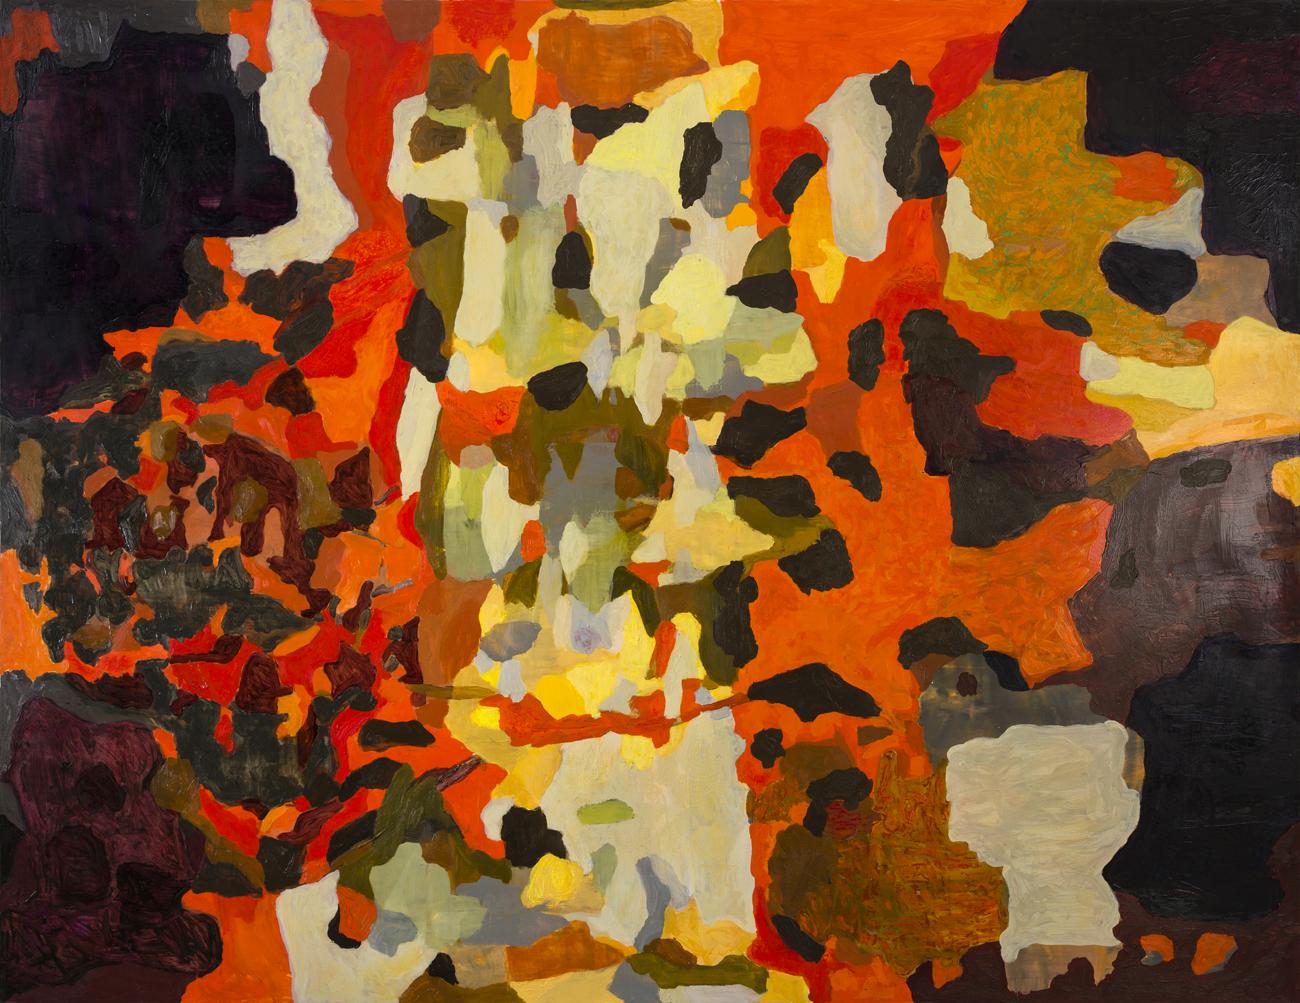 Rolf Hanson  Utan titel  2004 Oil on canvas 185 x 240 cm